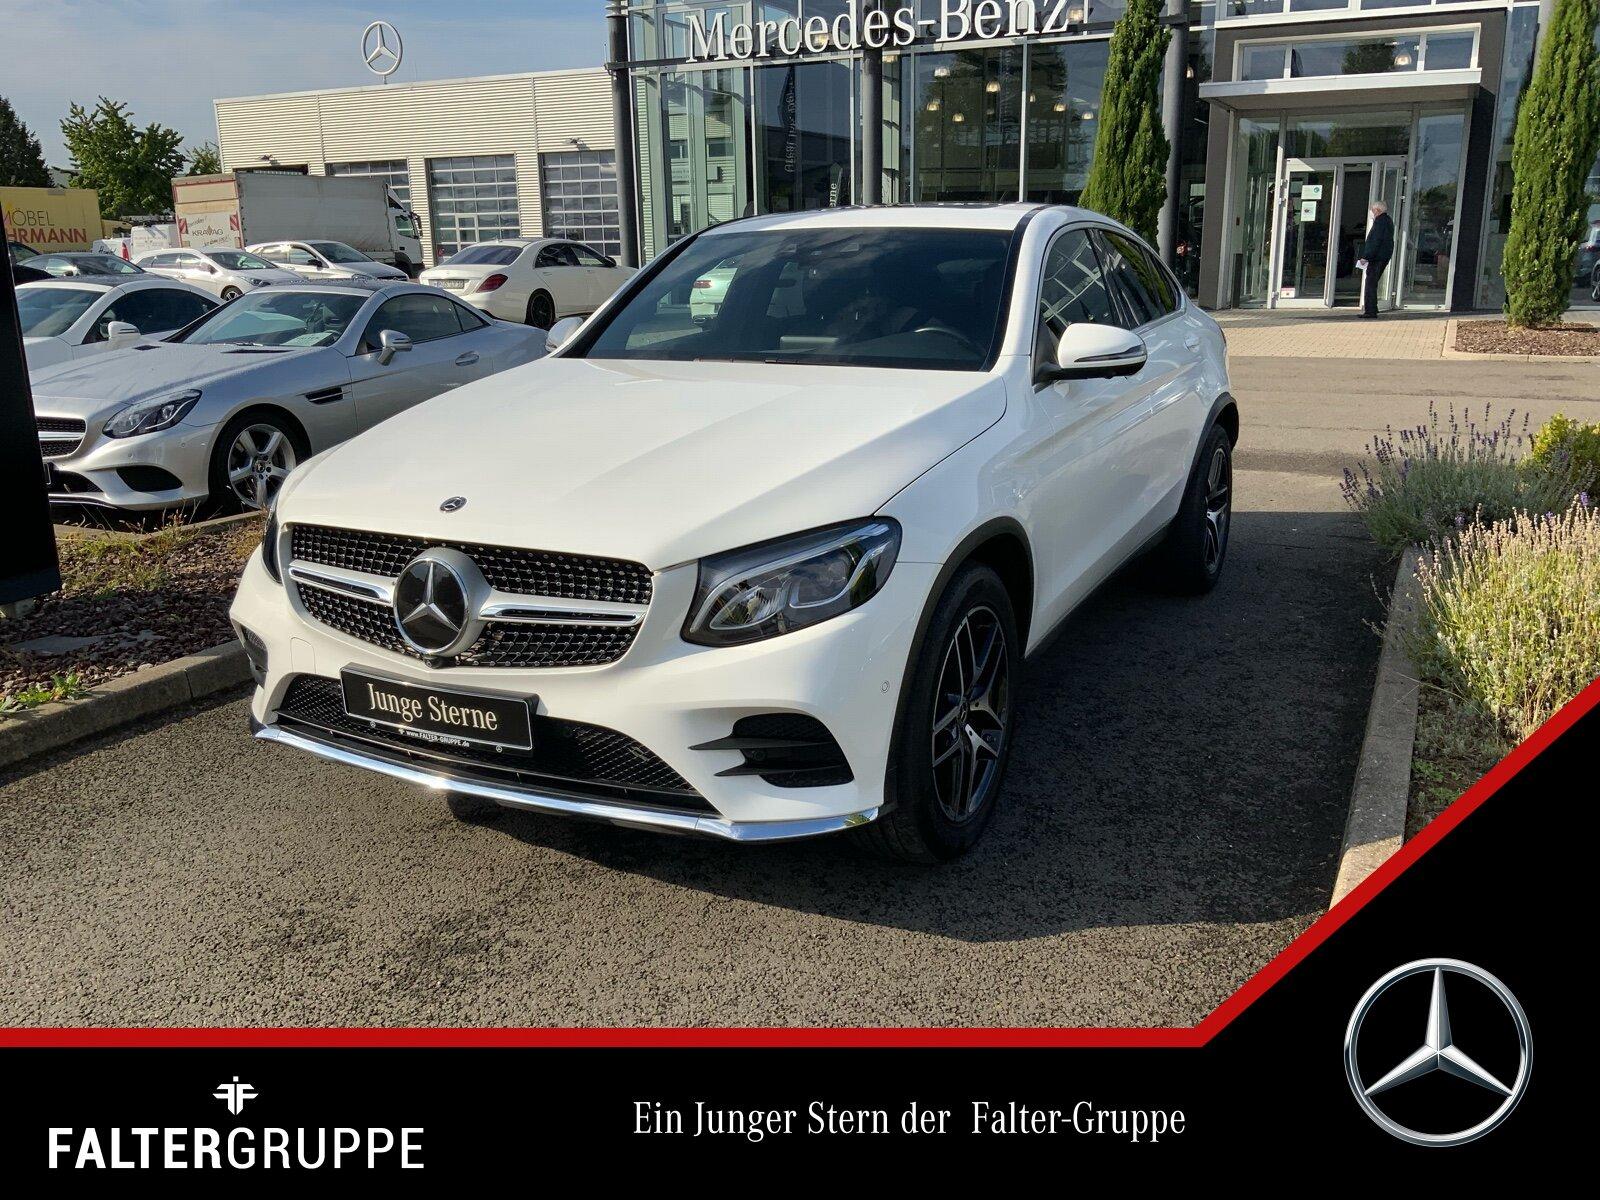 Mercedes-Benz GLC 300 Cpé AMG Standhzg DISTRO Navi GSD 360°LED, Jahr 2017, Benzin